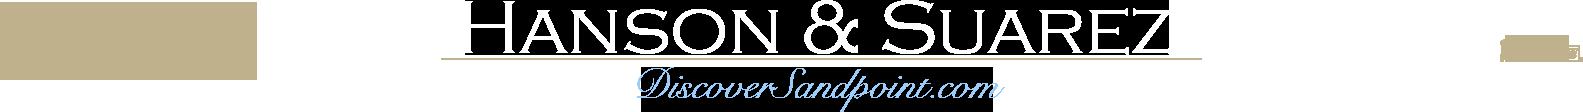 Hanson and Suarez Discover Sandpoint, Idaho